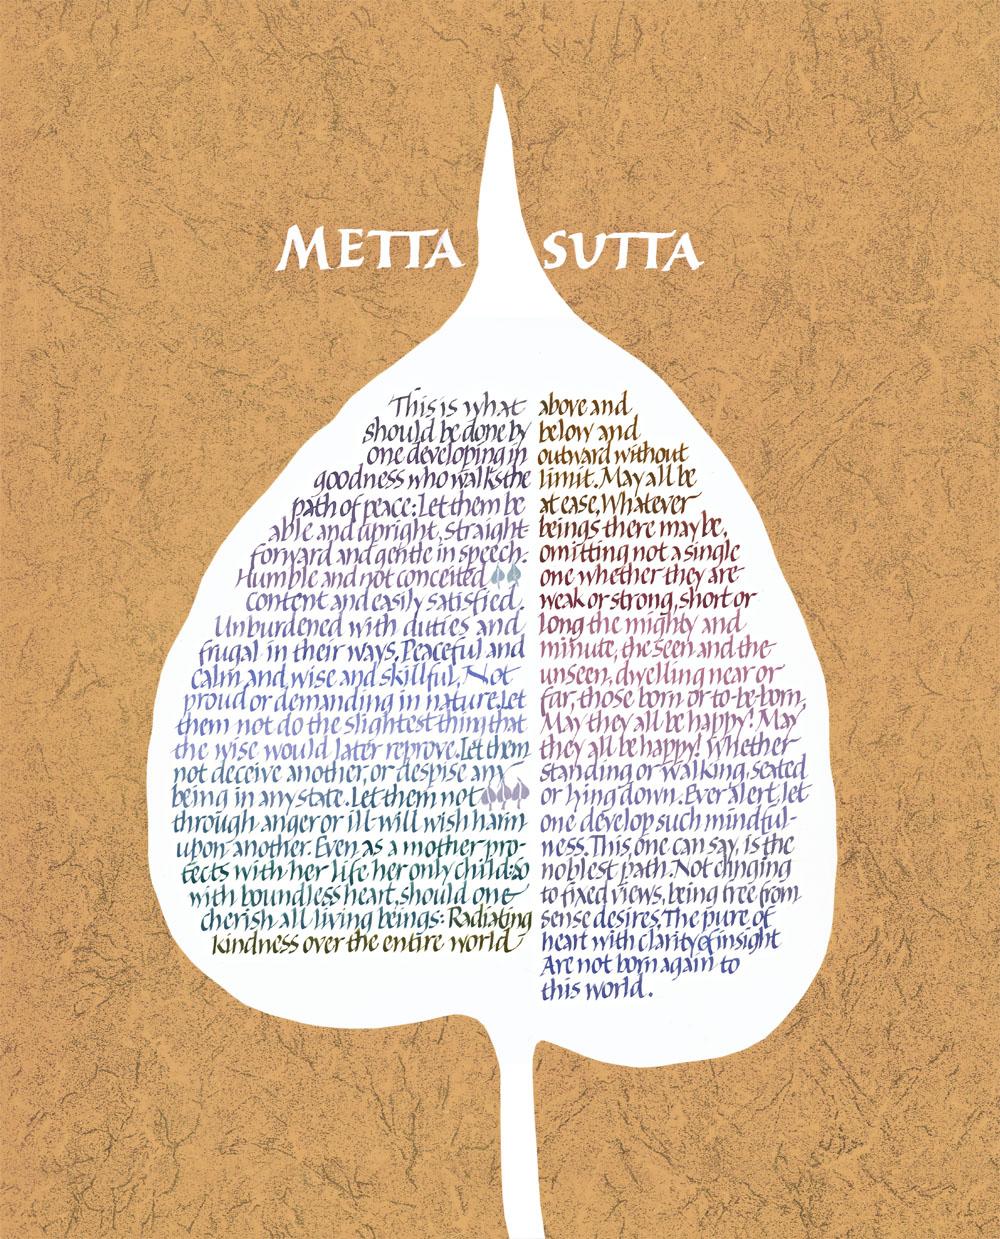 Dhamma-Sutta.jpg